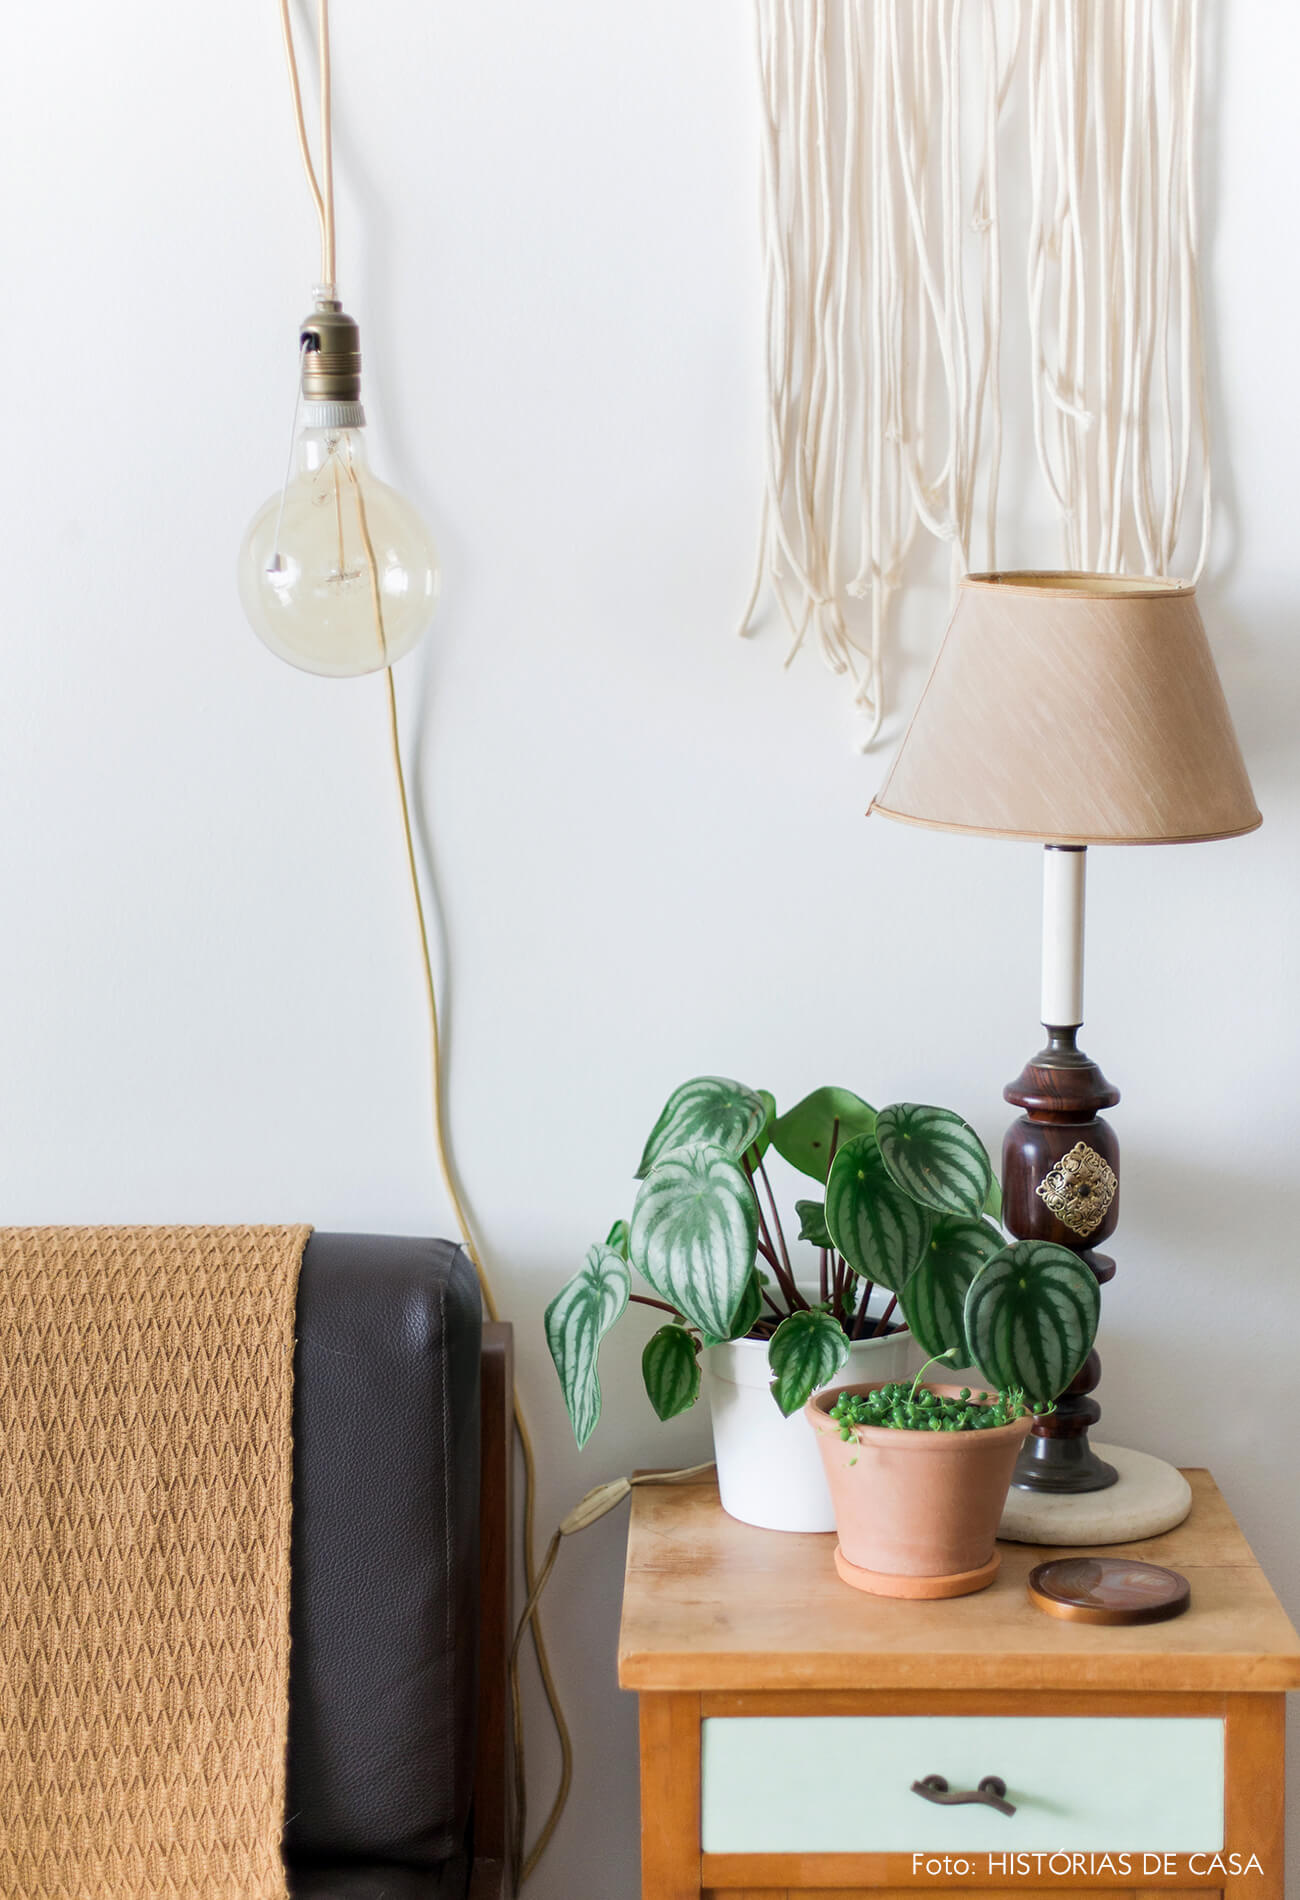 Mesa lateral com plantas e hanger de macramê na parede